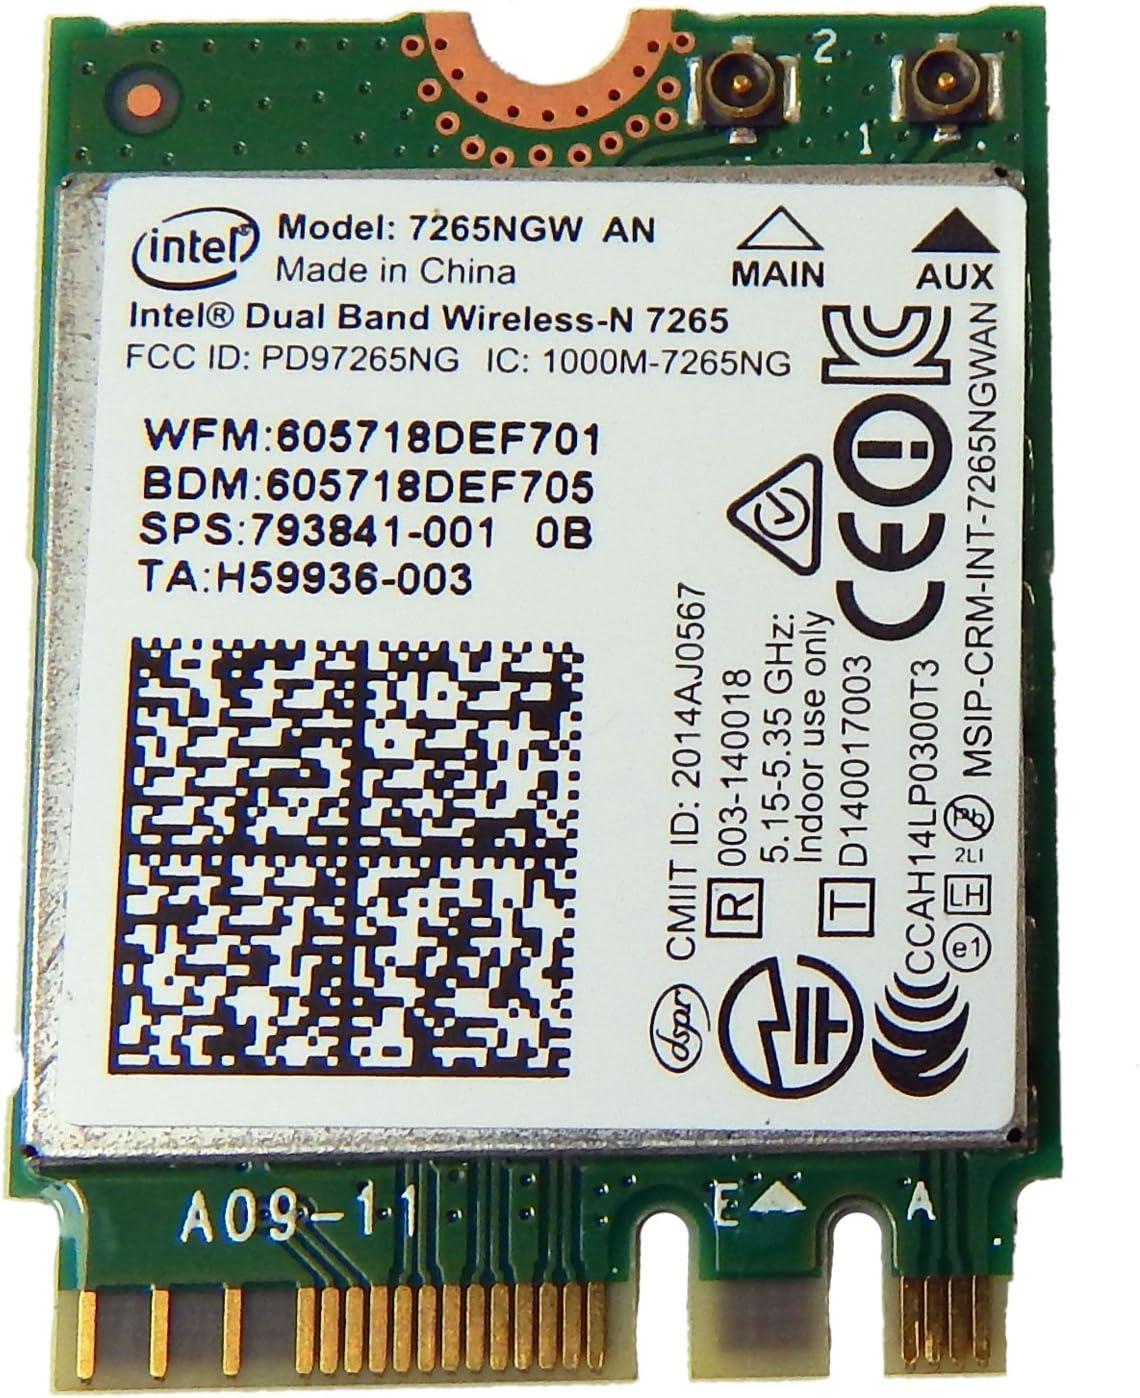 Intel 7265NGW an WLAN M.2 2x2 WiFi BT4 Mod 793841-001 802.11ac WiFi Bluetooth